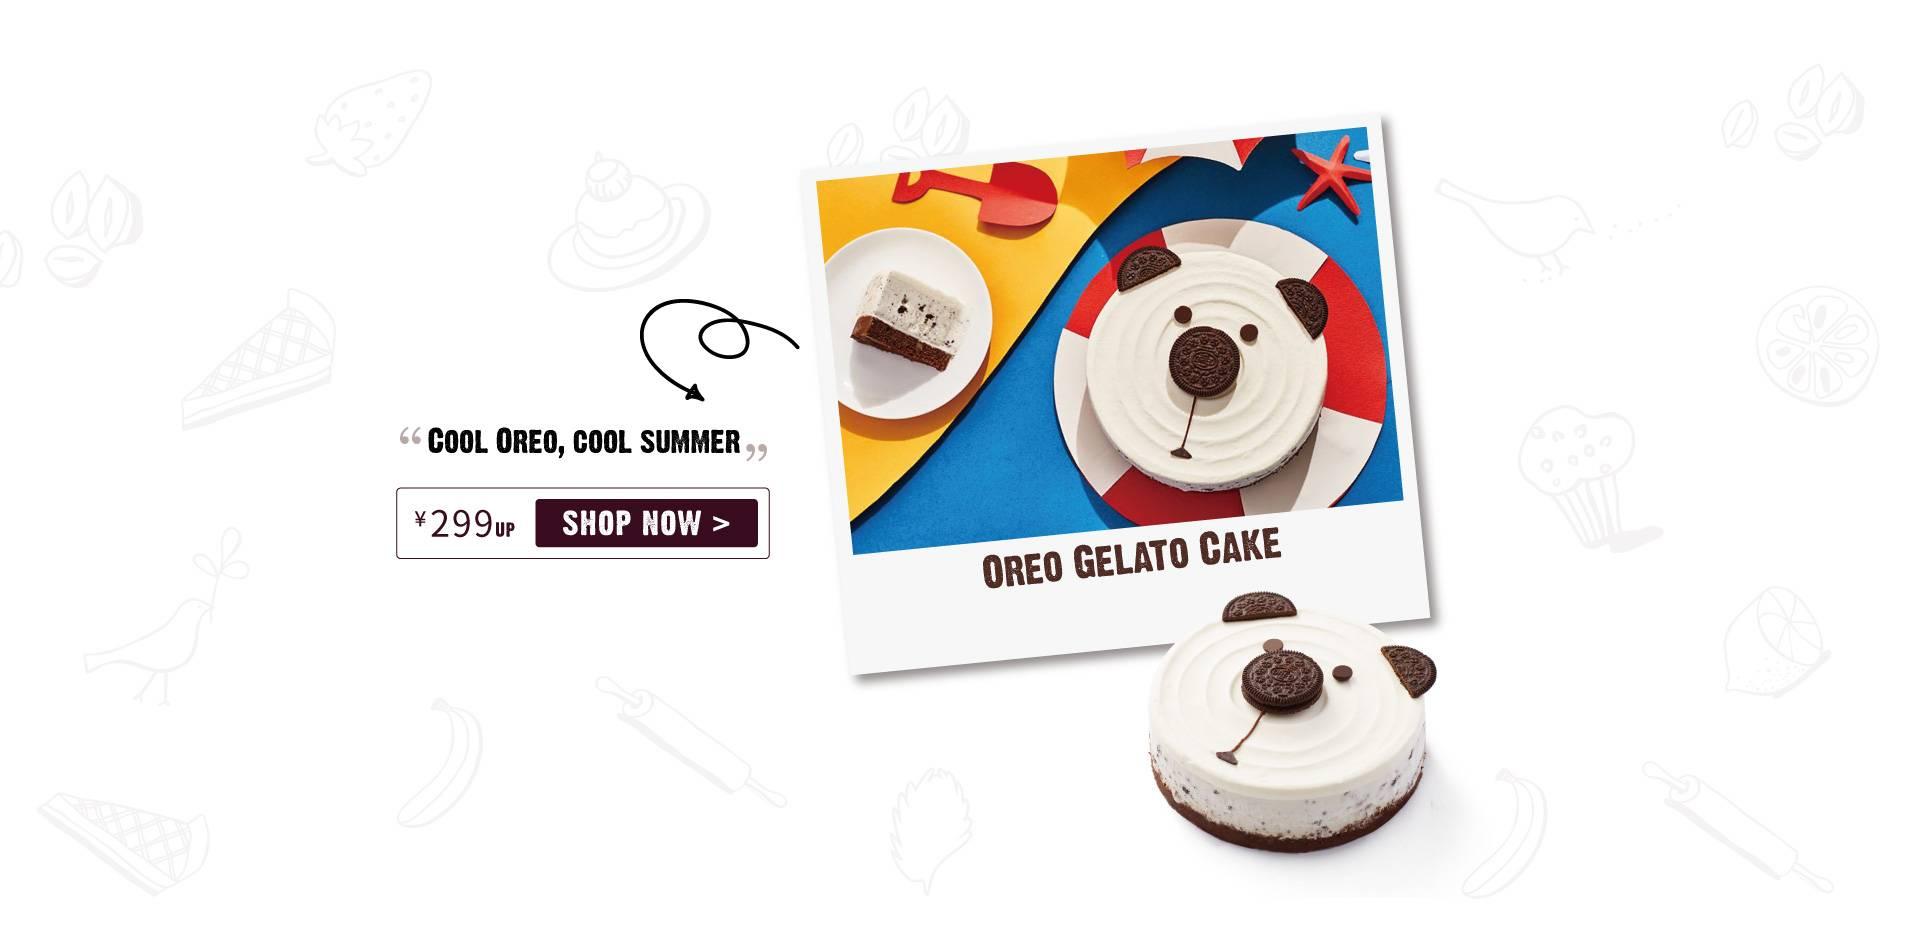 Oreo Gelato Cake